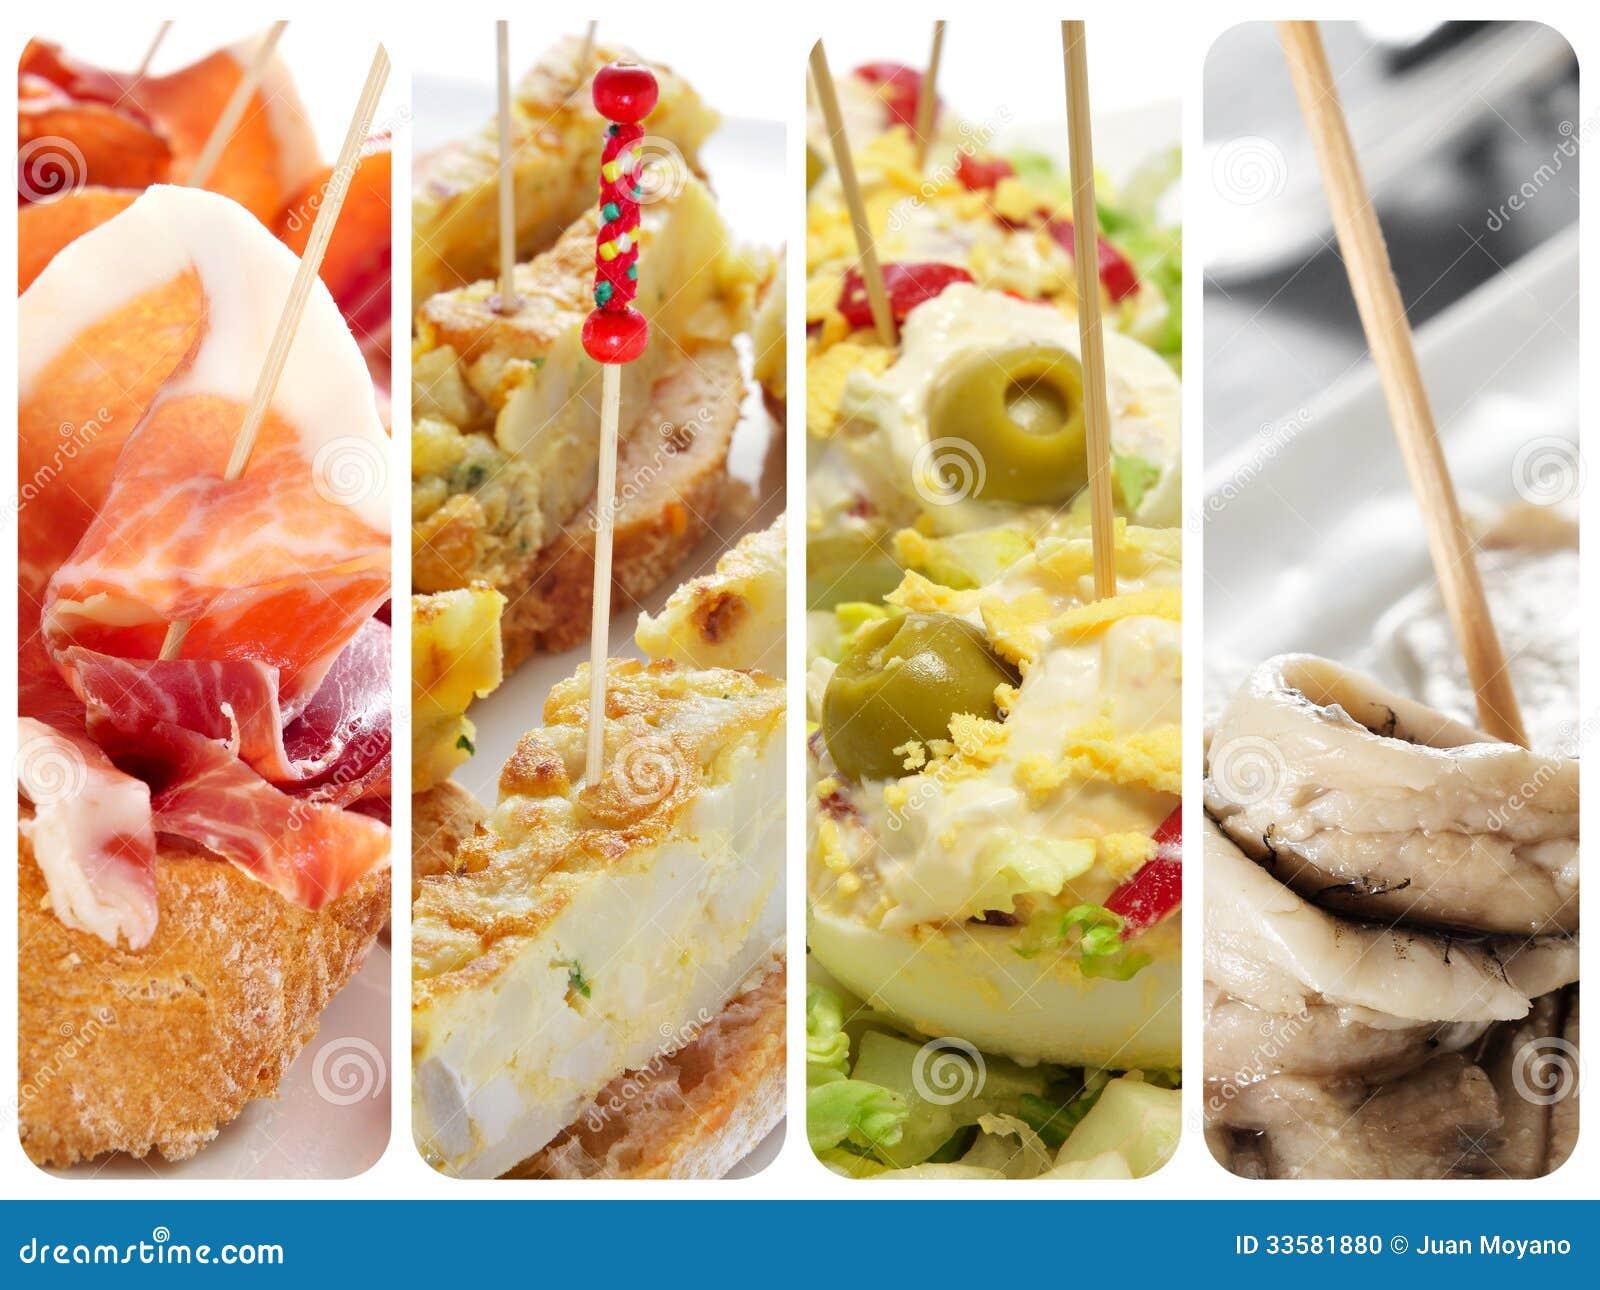 Spanish Tortilla De Patatas Sandwich Stock Image ...